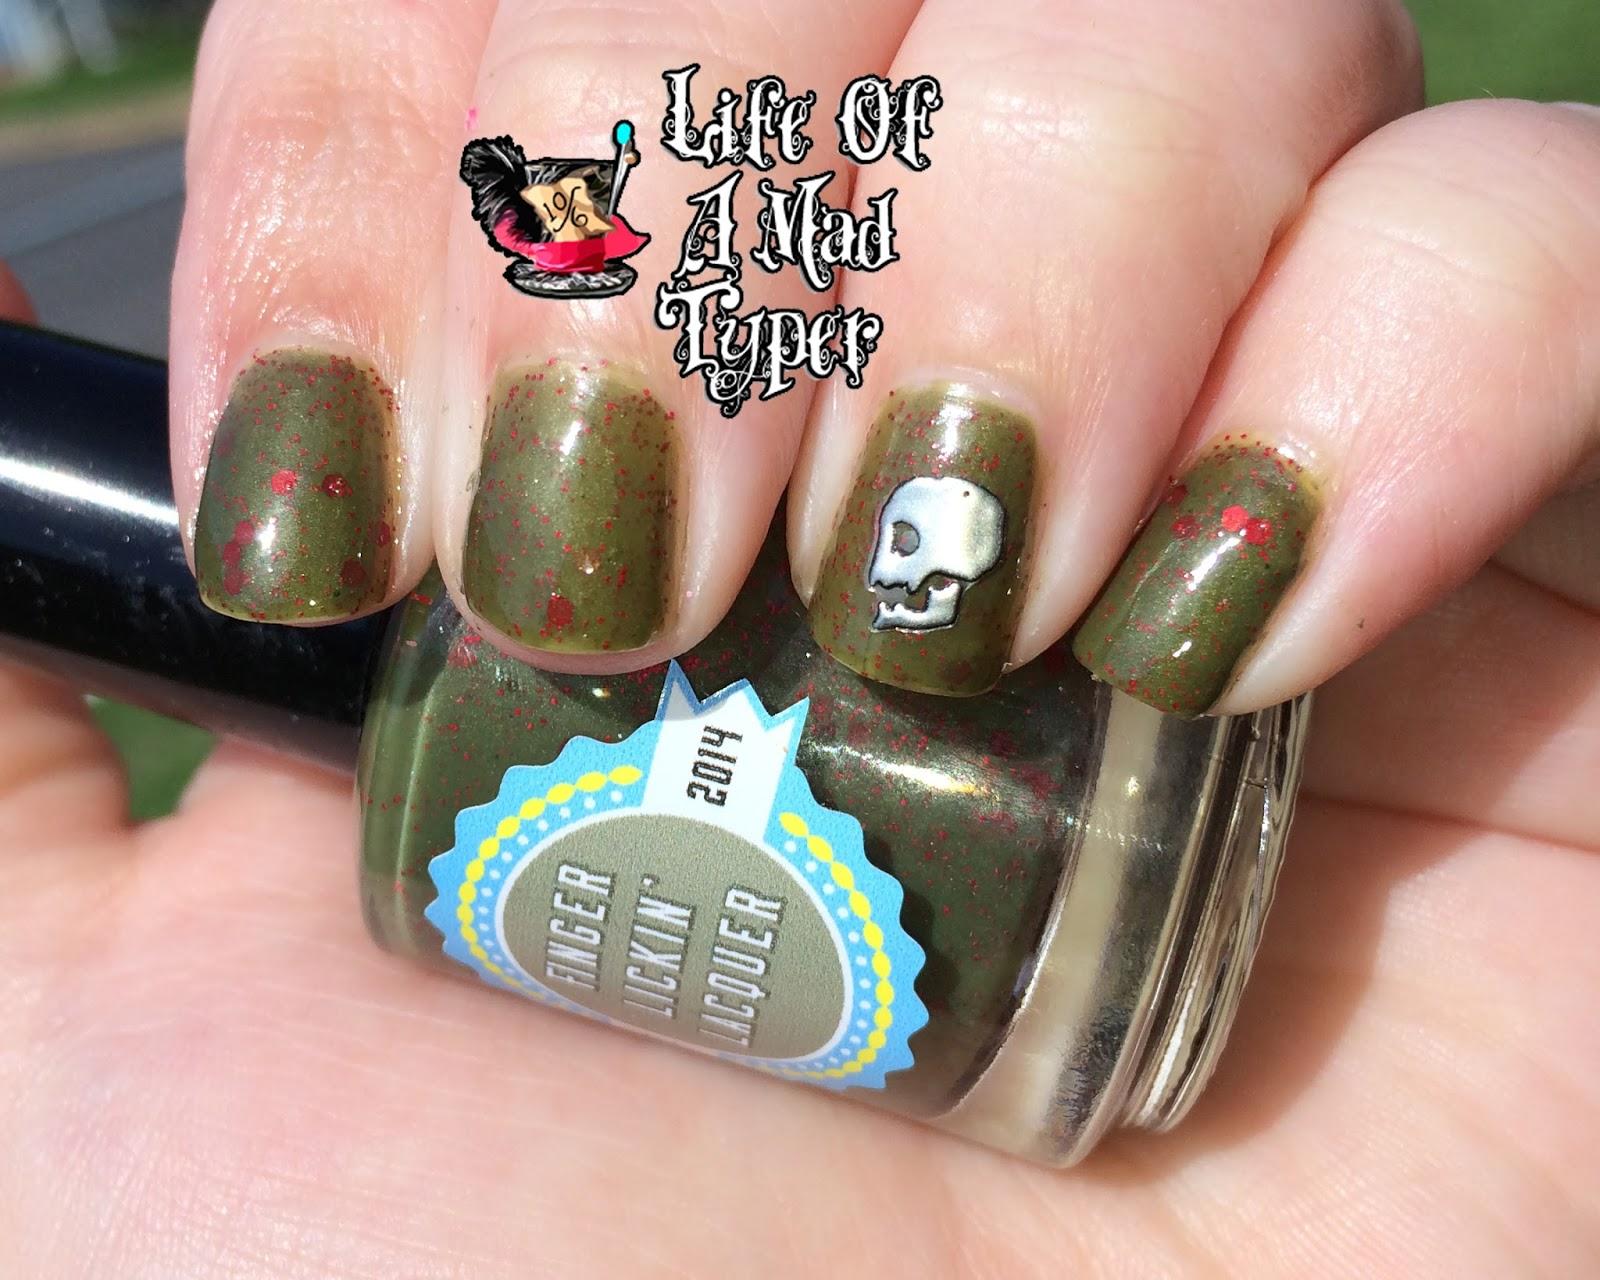 Croatoan Finger Lickin lacquer